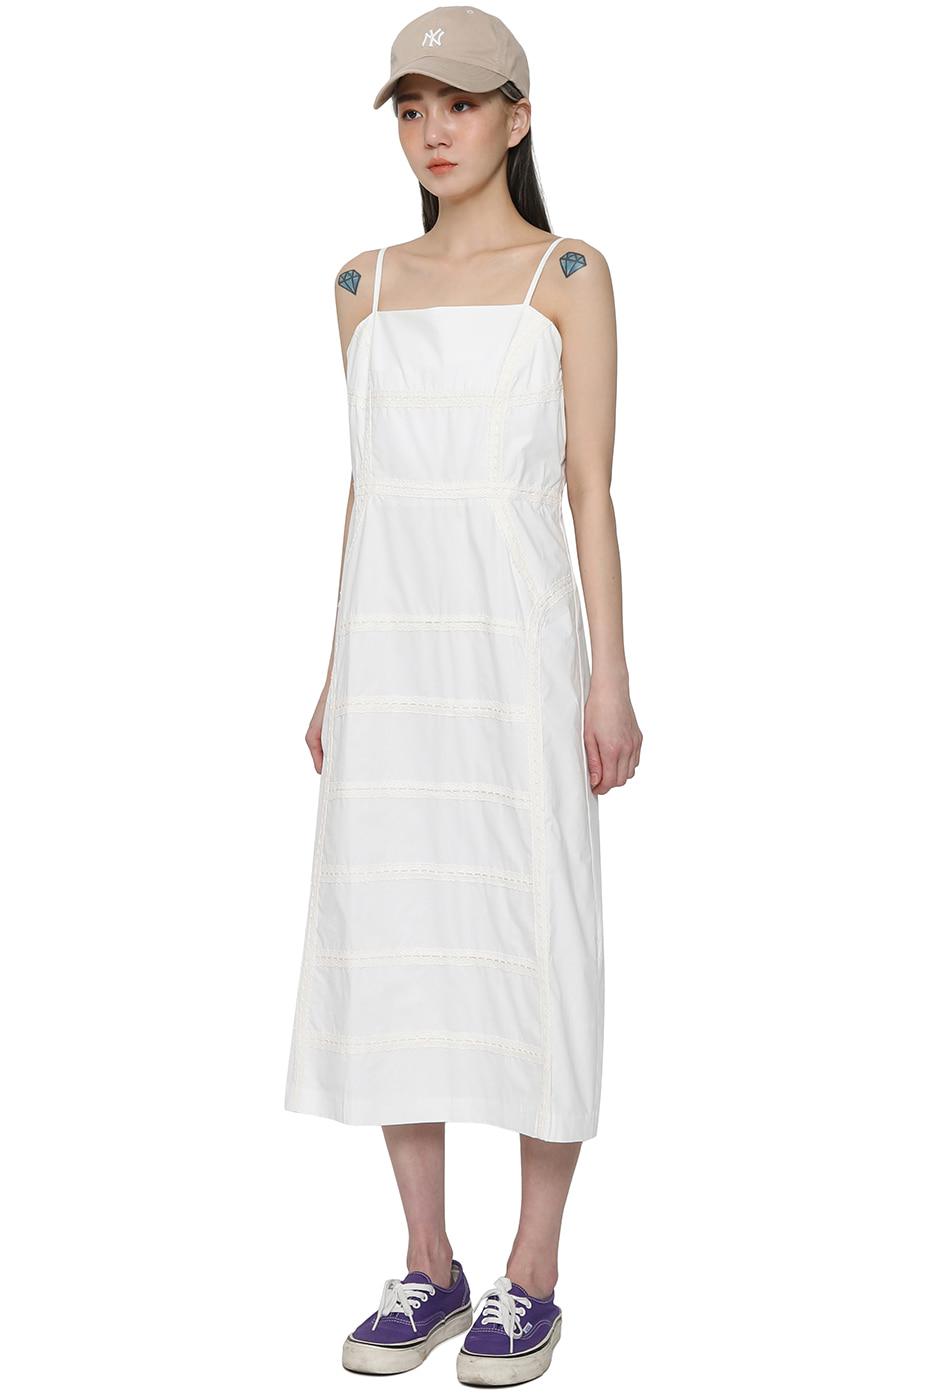 Four-in-one lace slip midi dress